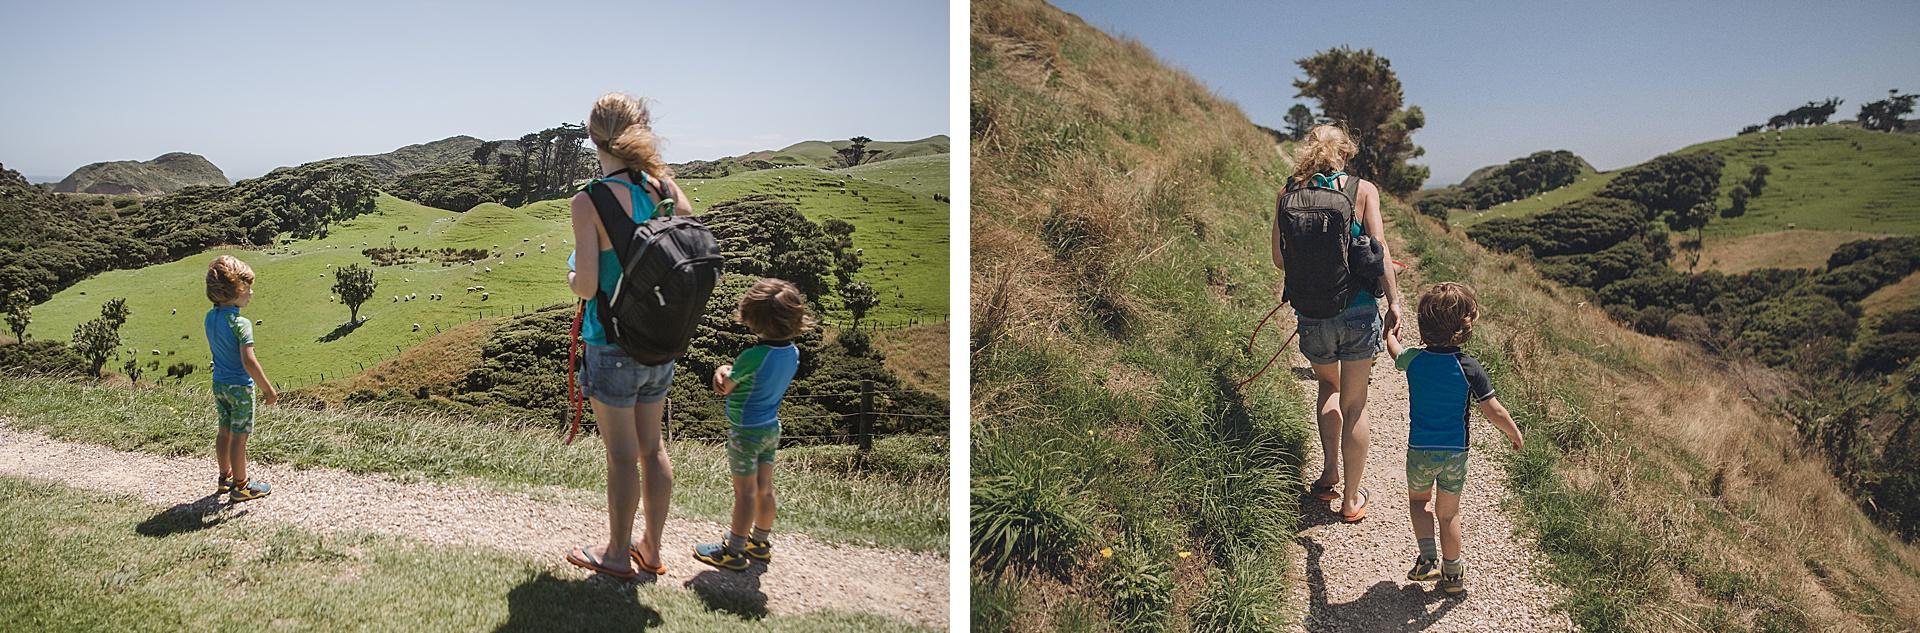 family-roadtrip-neuseeland-travelnewzealand-danielzube_0551.jpg